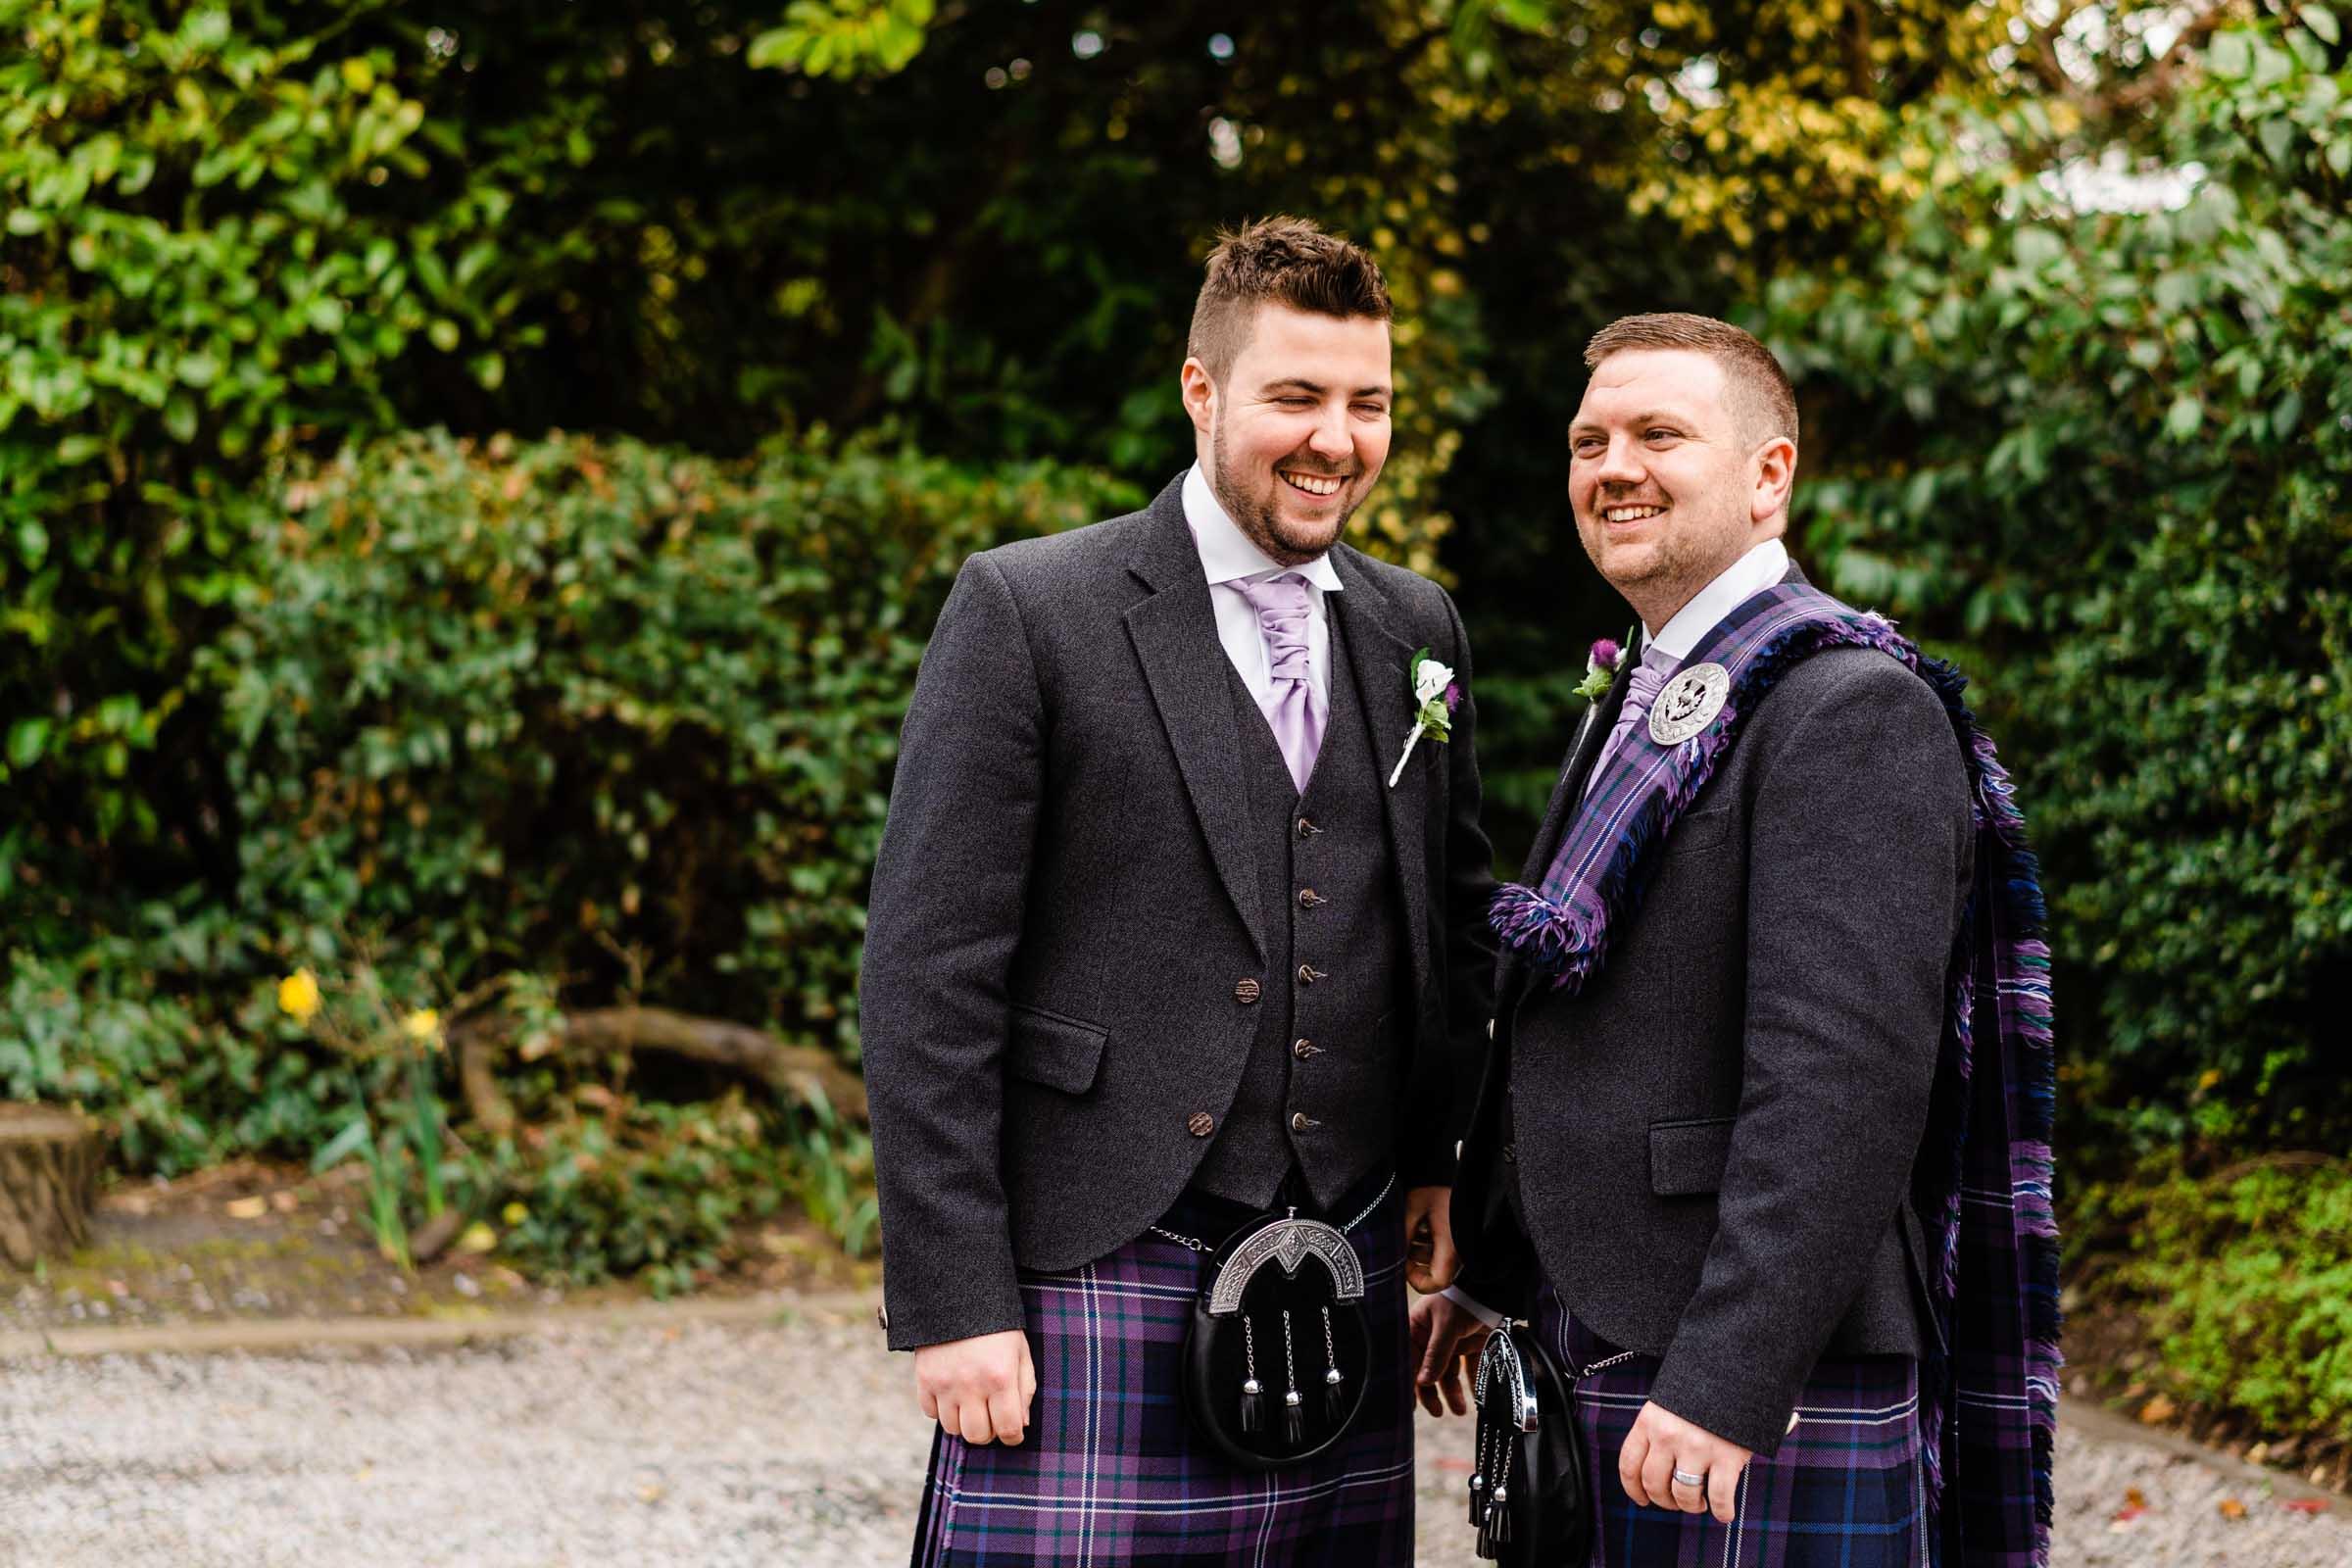 motherwell-moorings-wedding-photographer-dearlyphotography (54 of 77).jpg